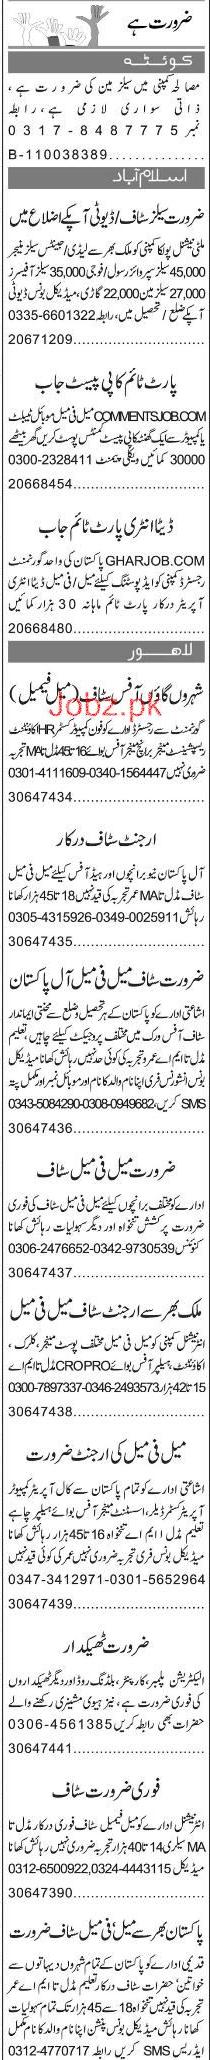 Salesmen, Sales Supervisors, Computer Operators Wanted